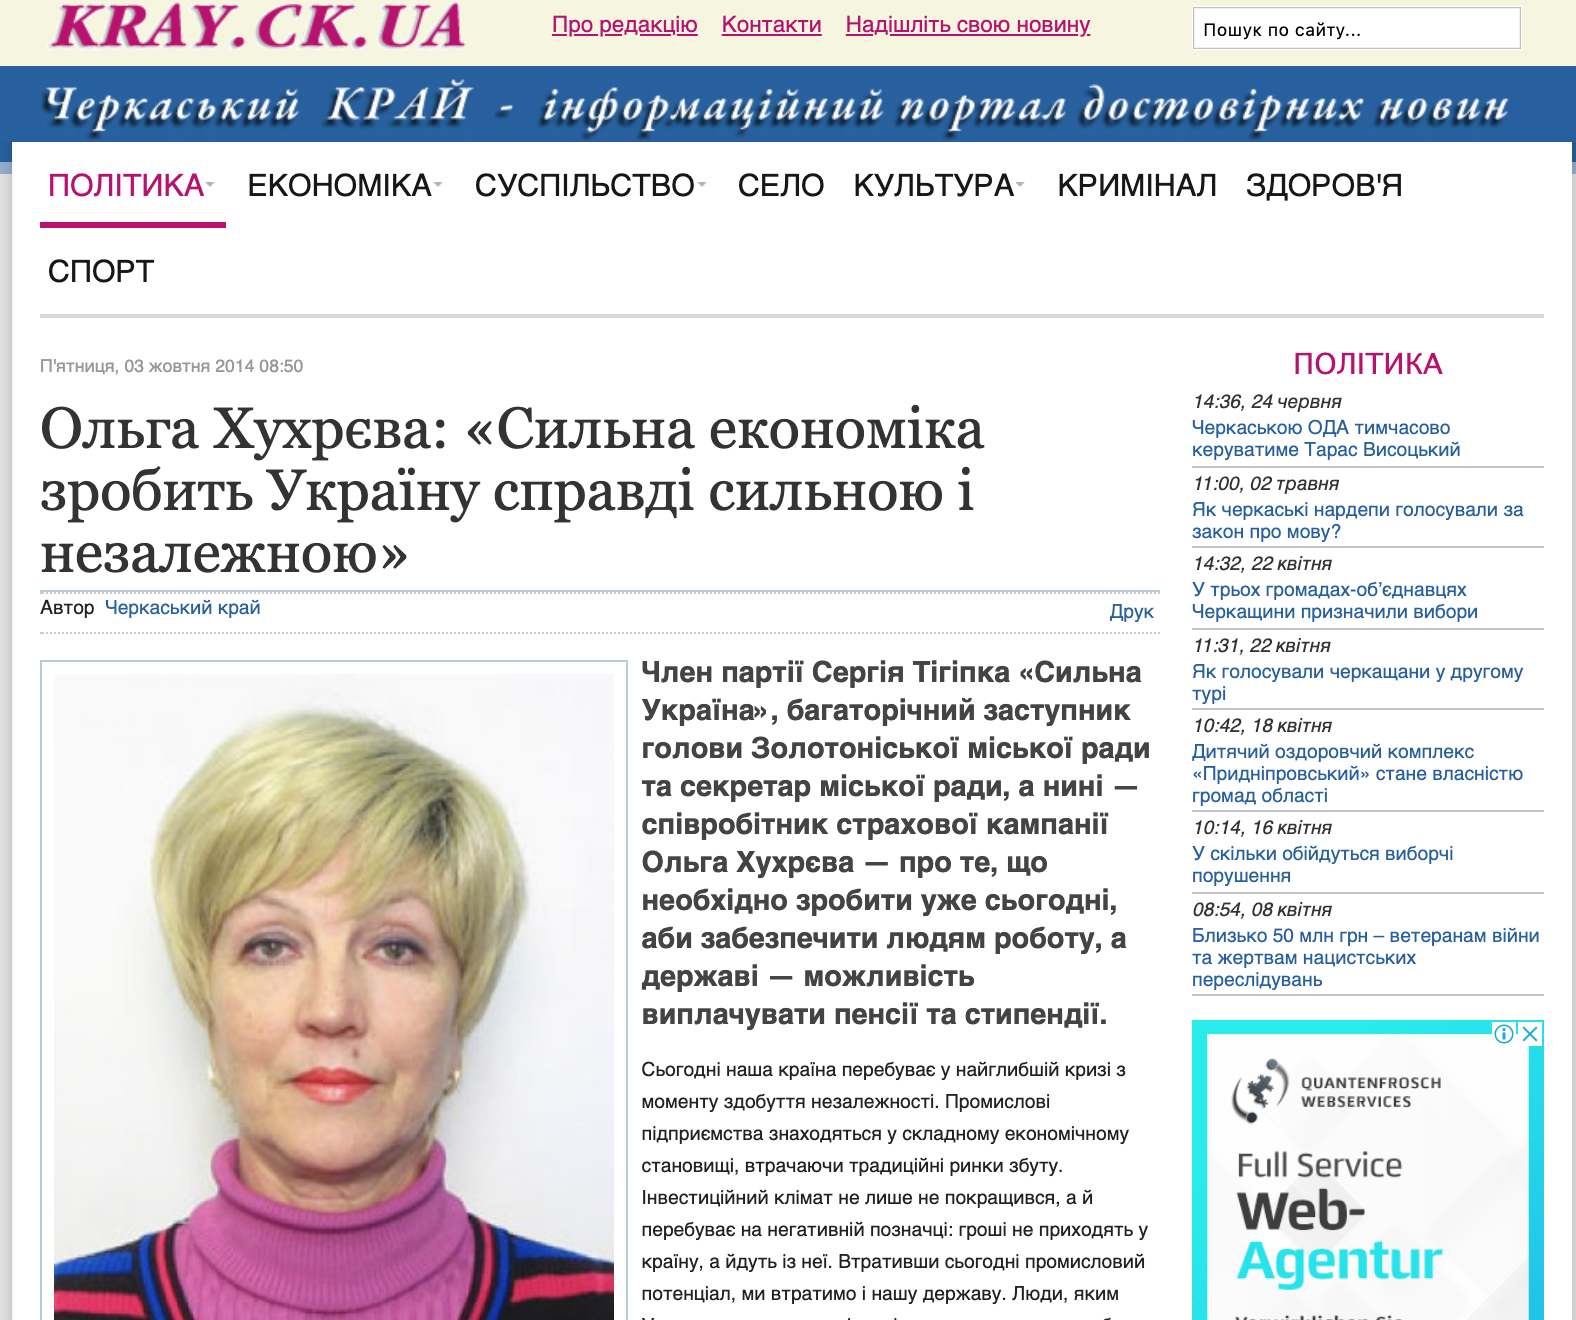 Ольга Хухрева